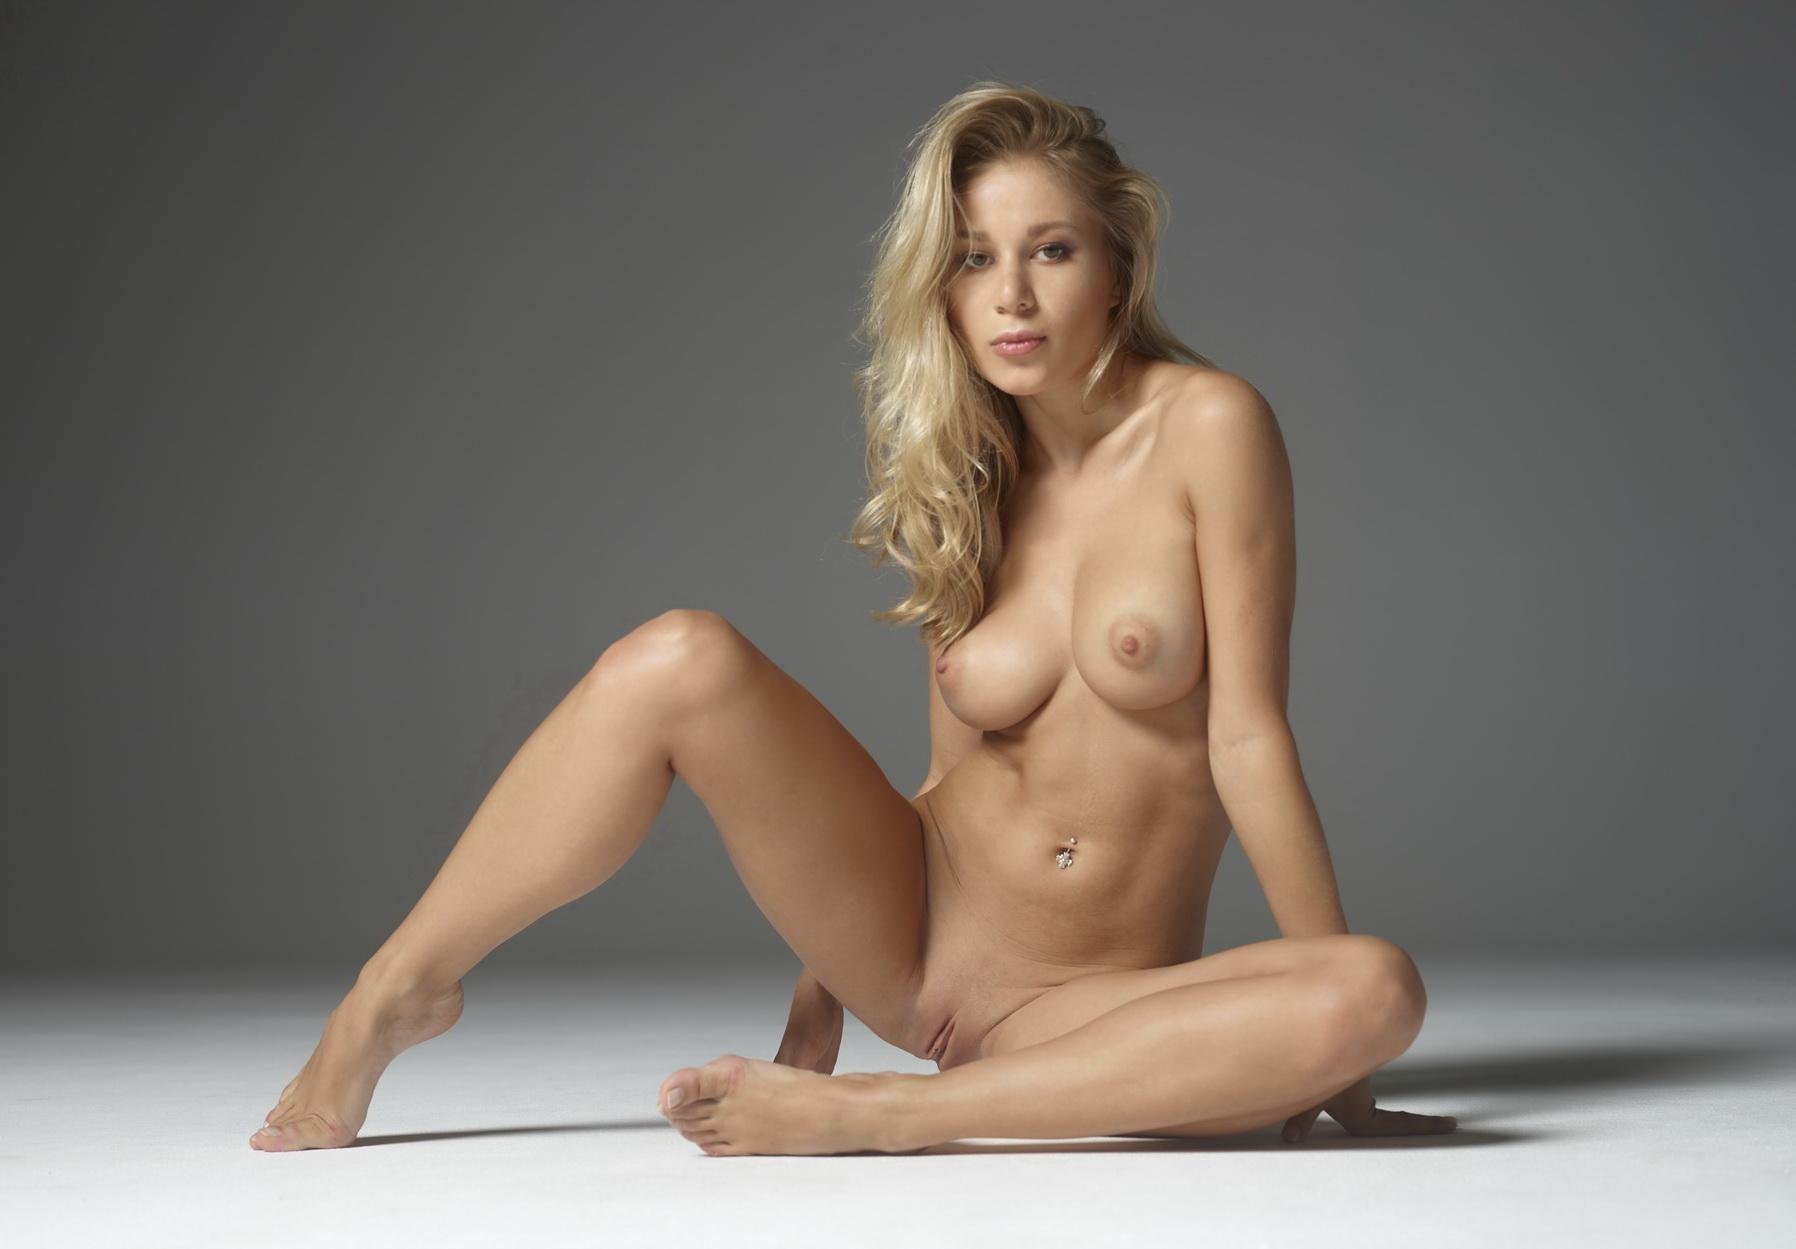 Beautiful blonde women pics